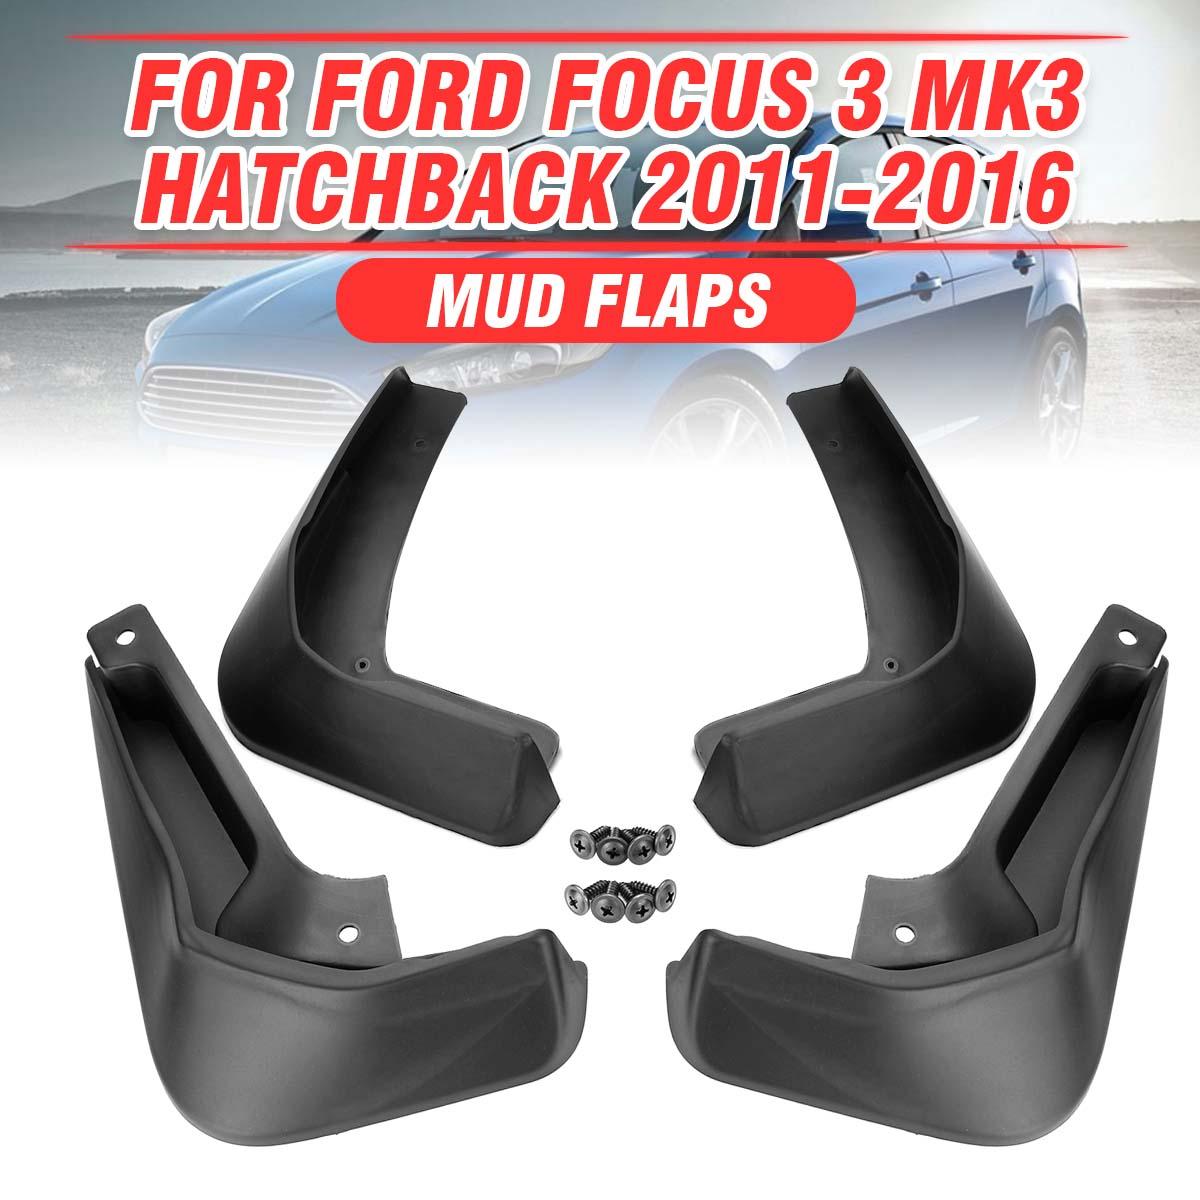 Car Mud Flaps Mudguards Mudflaps Splash Guards For Fender Accessories For Ford/Focus 3 MK3 Hatchback 2011-2018